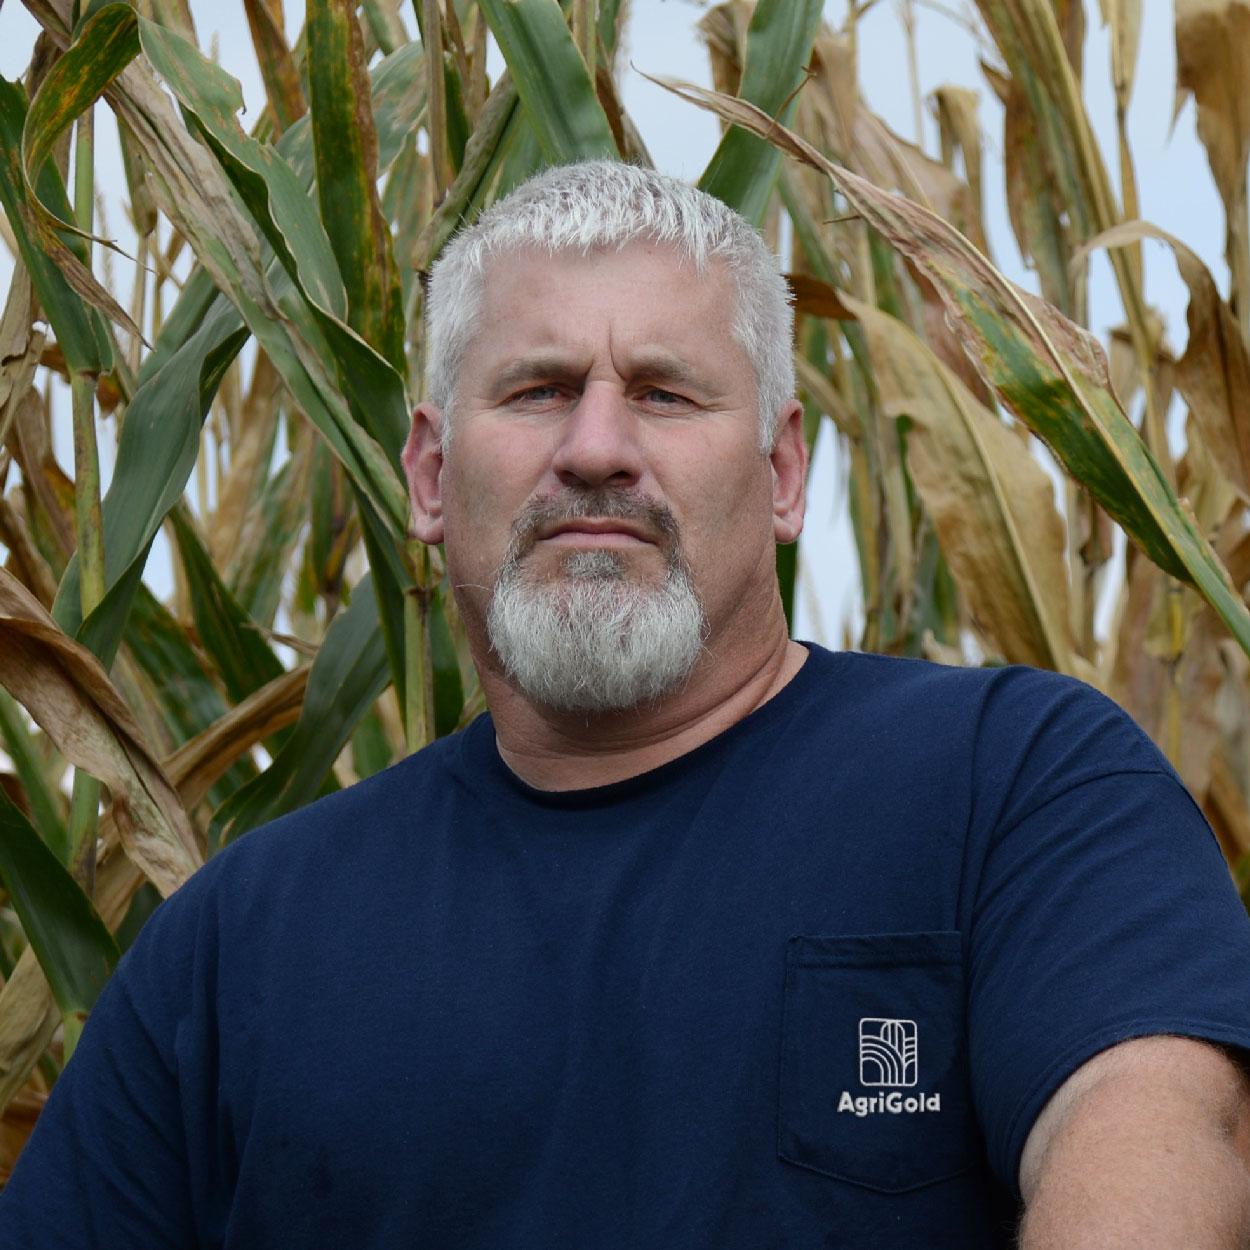 Randy Dowdy